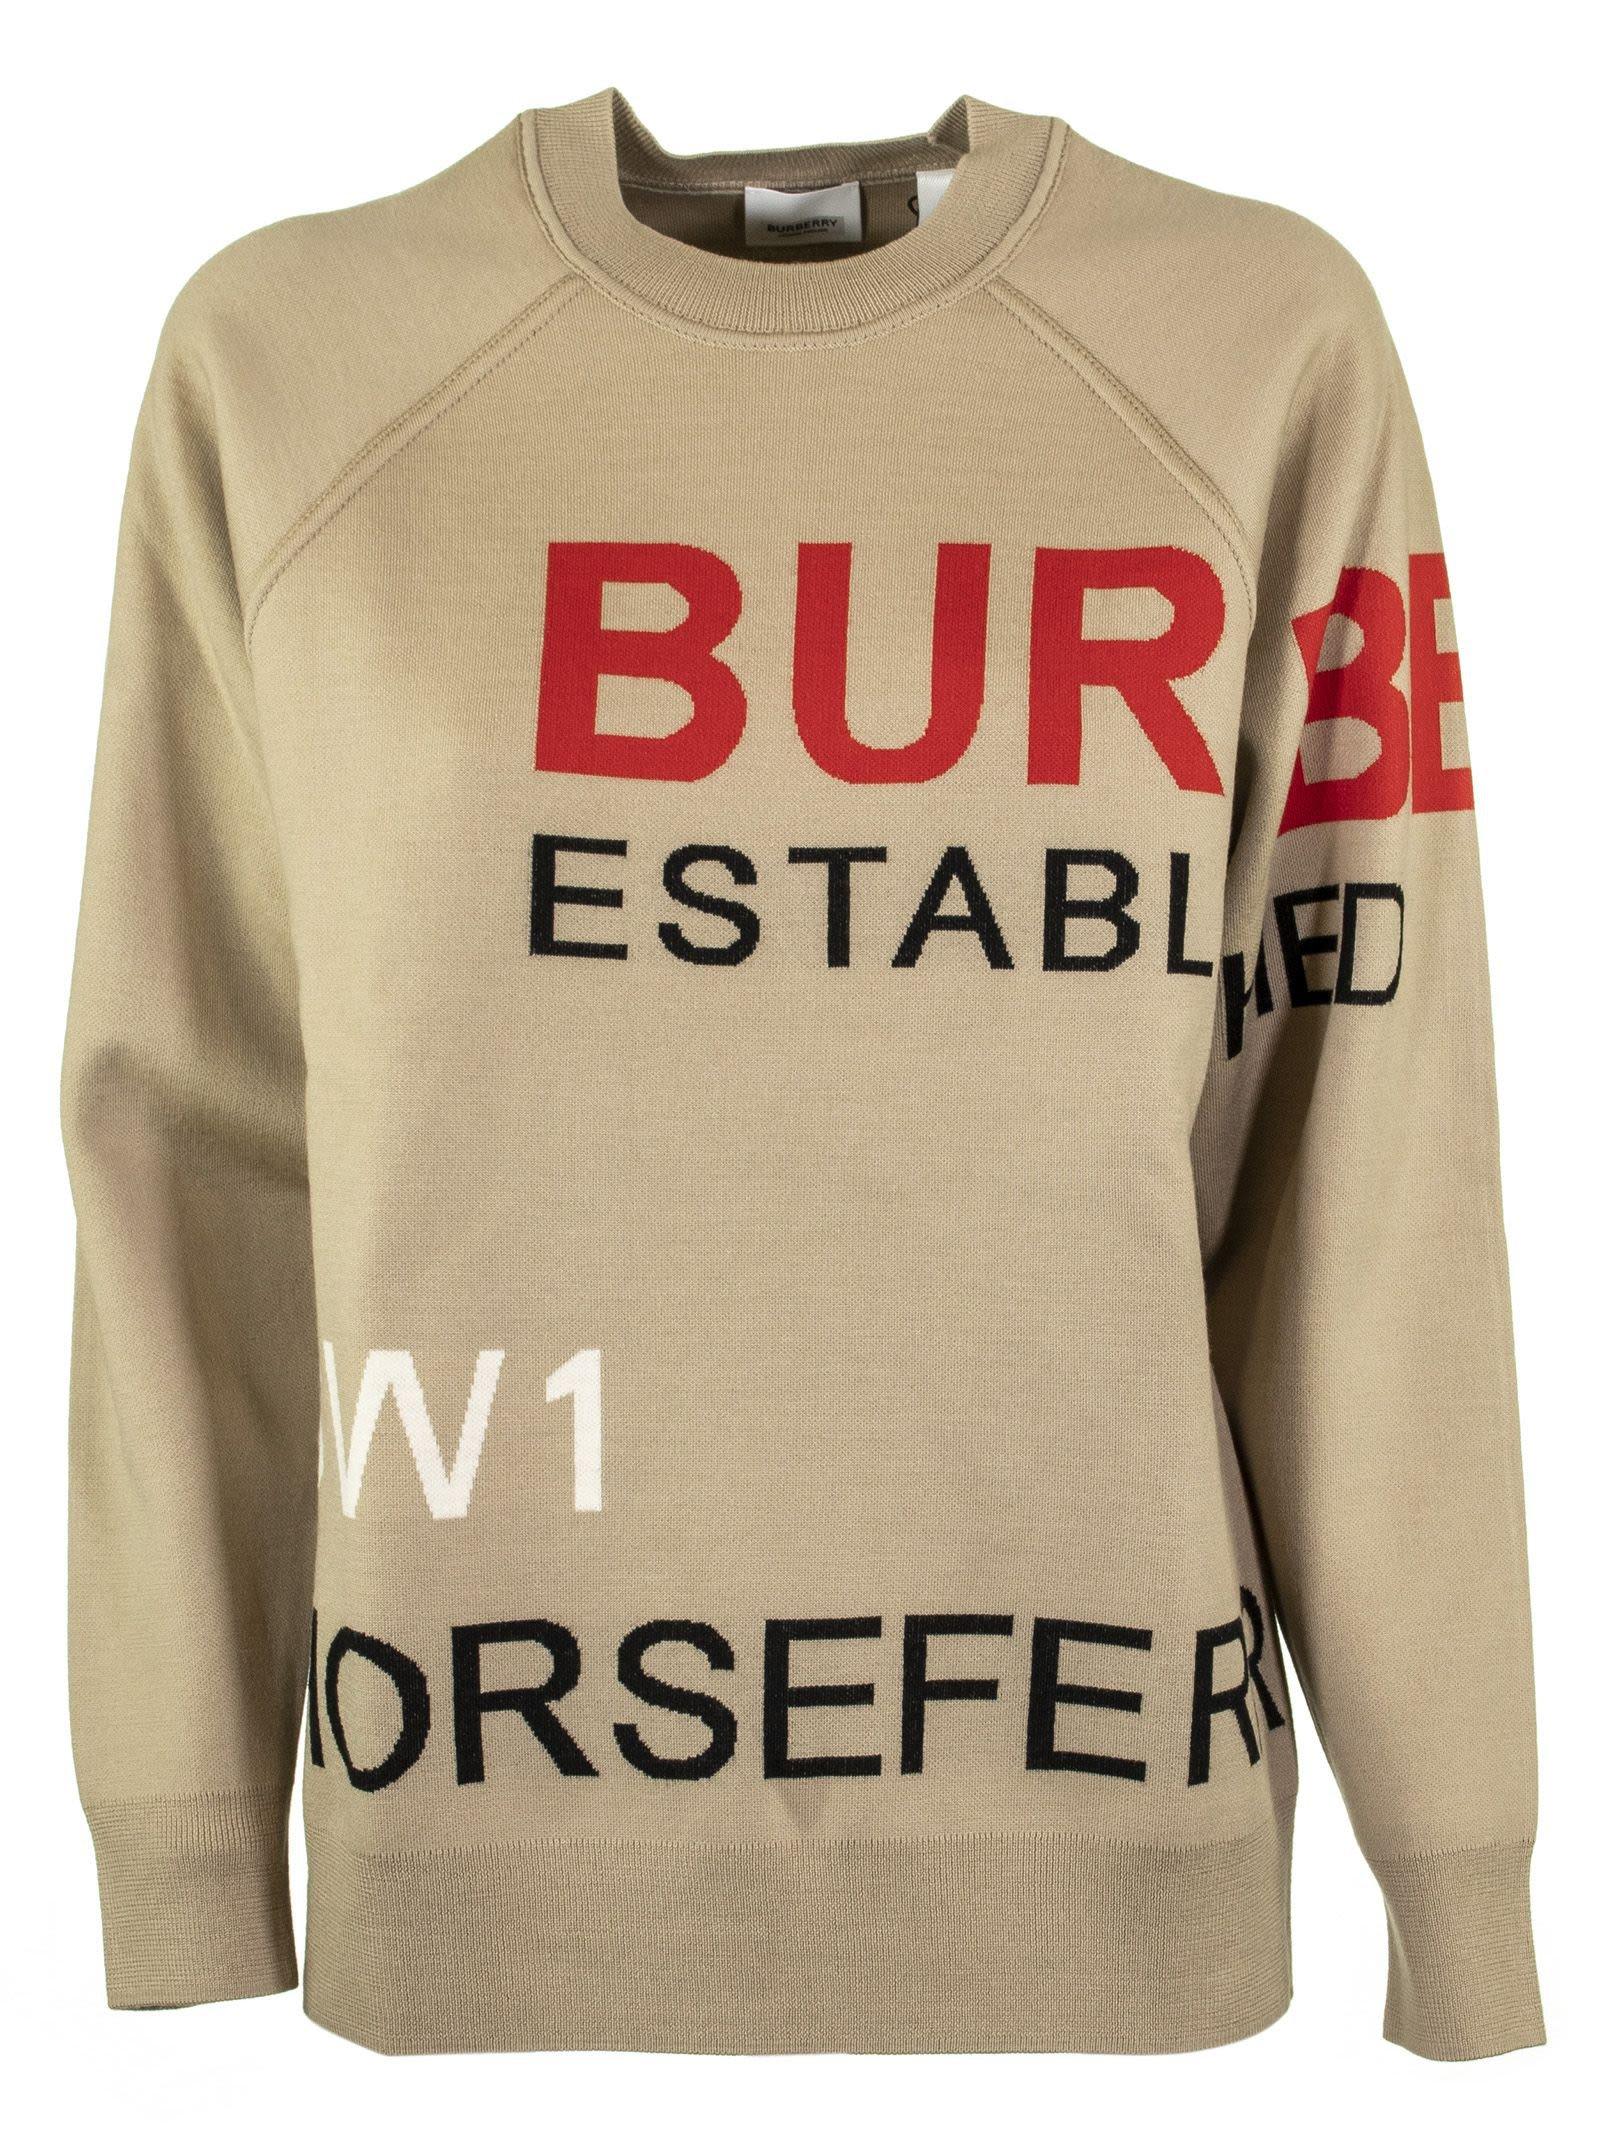 Burberry Horseferry Intarsia Merino Wool Blend Sweater